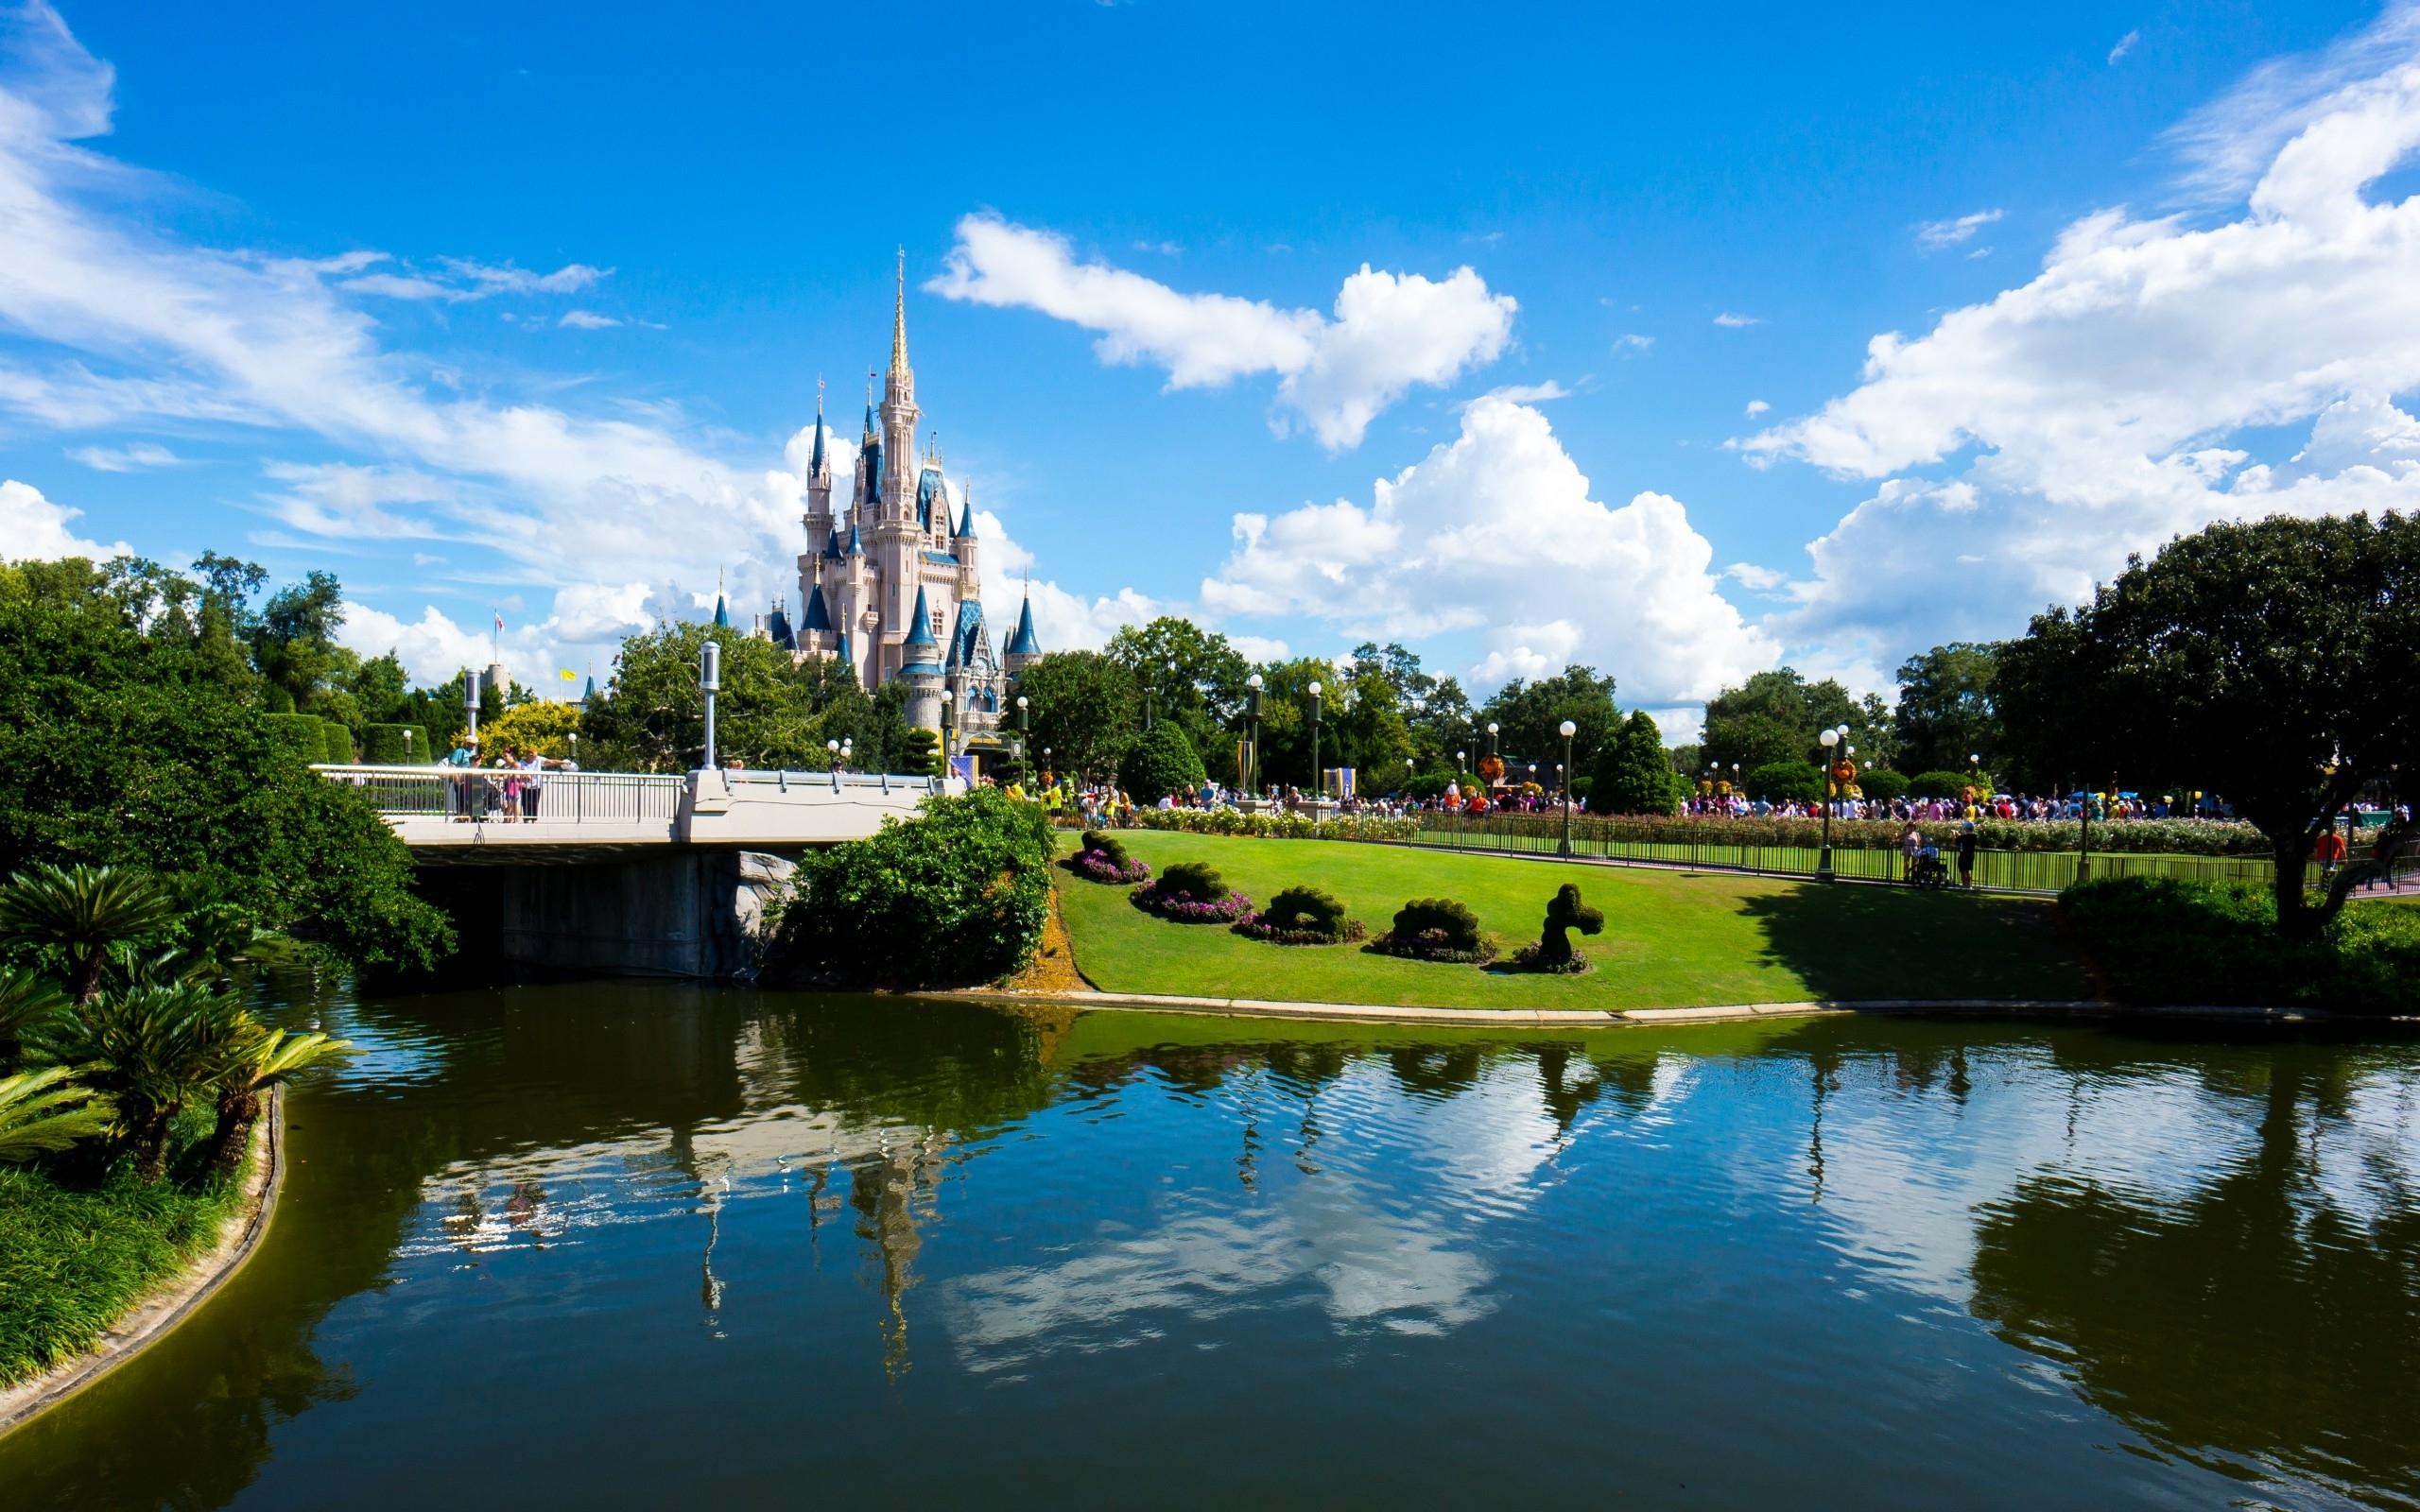 Disneyland wallpaper   1397923 2560x1600